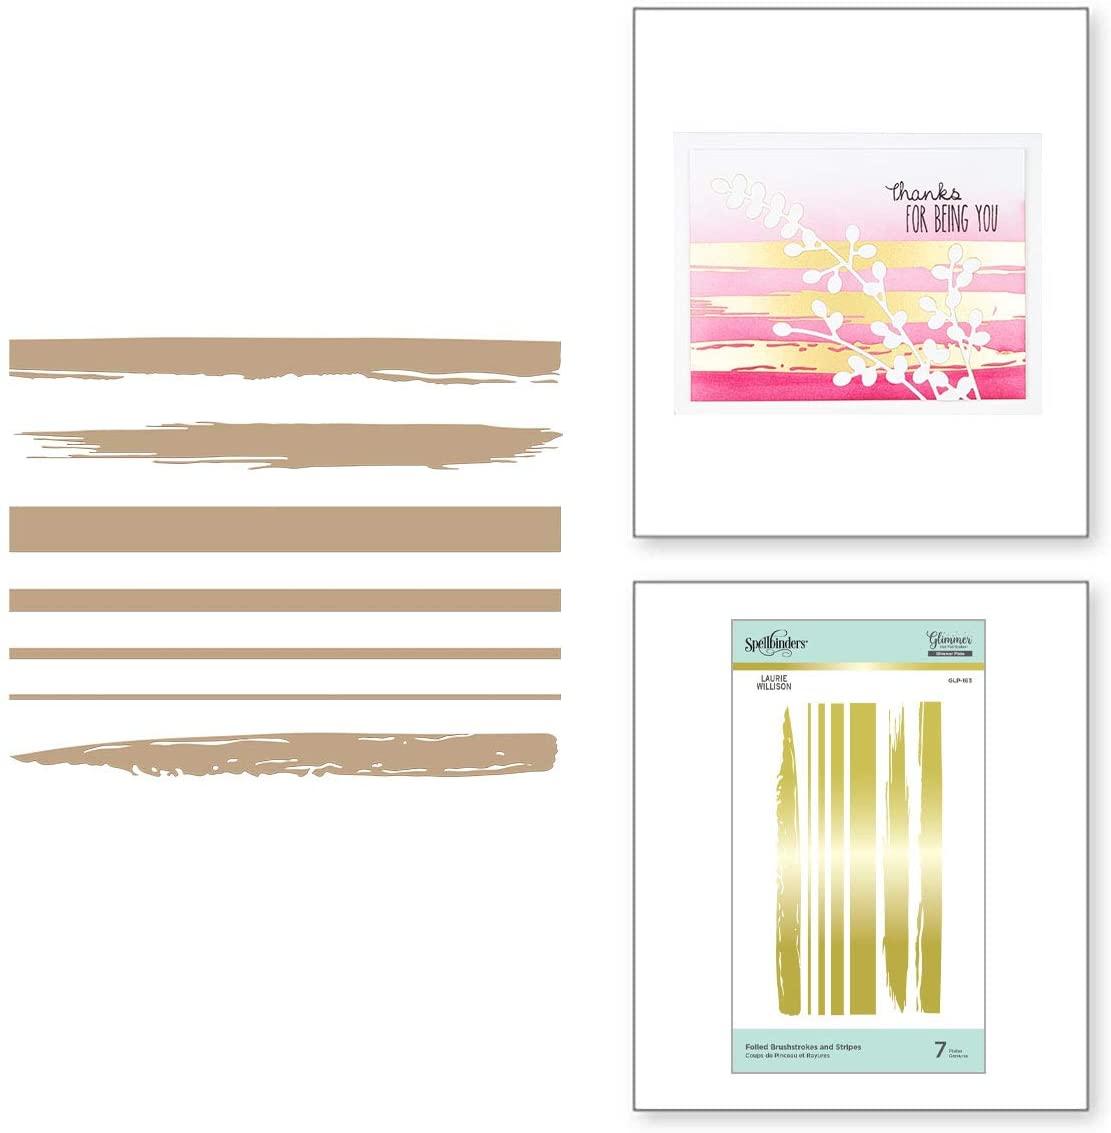 SPELLBINDERS PAPERCRAFTS, INC GLIMMER PLATES BRUSHSTRKS, Foiled Brushstrokes And Stripes